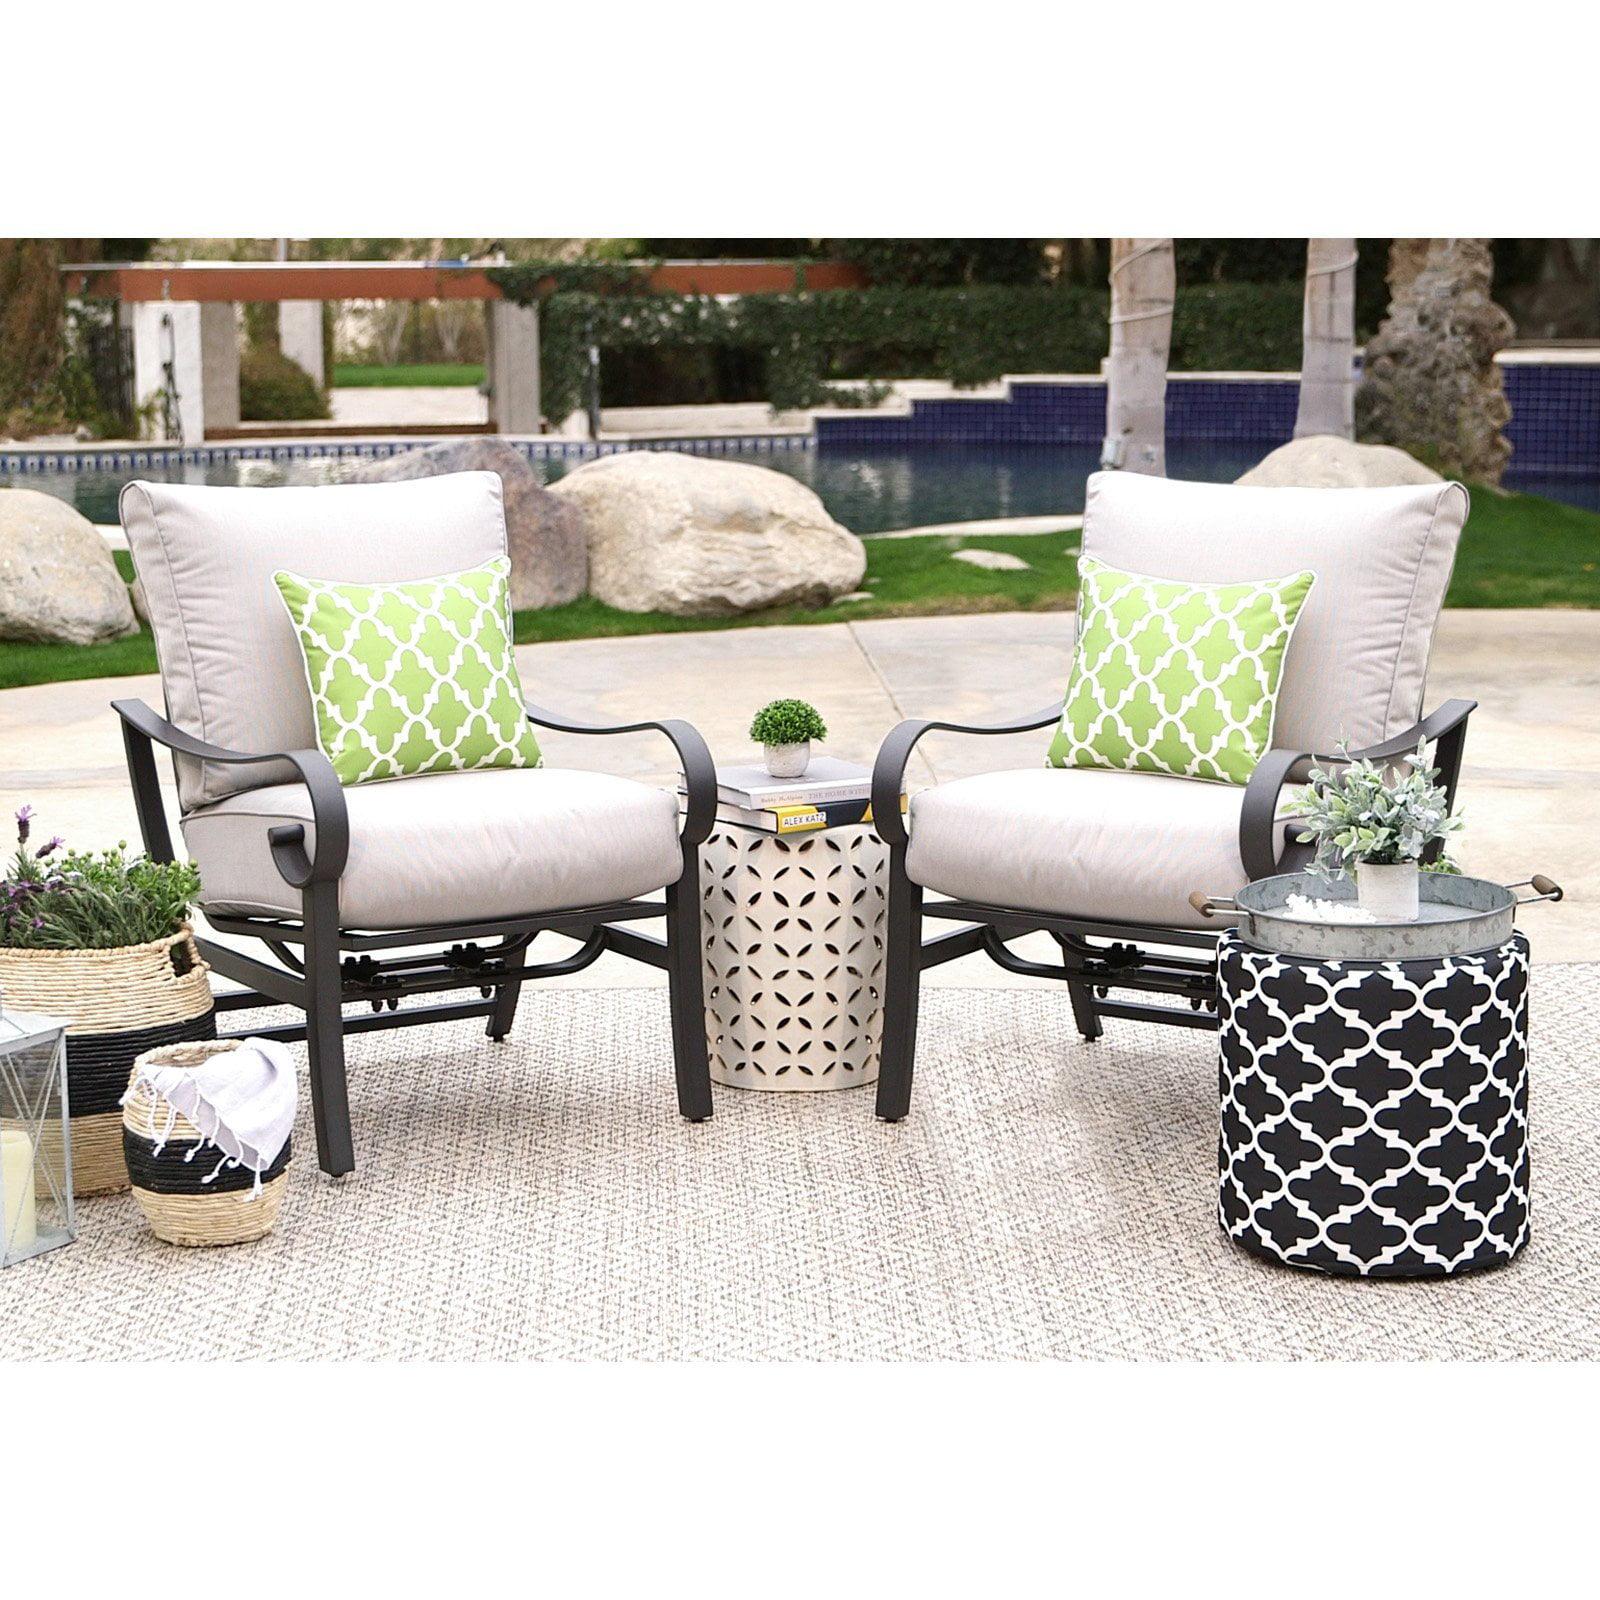 Belham Living Danbury Stationary Rocker Lounge Chair - Set of 2